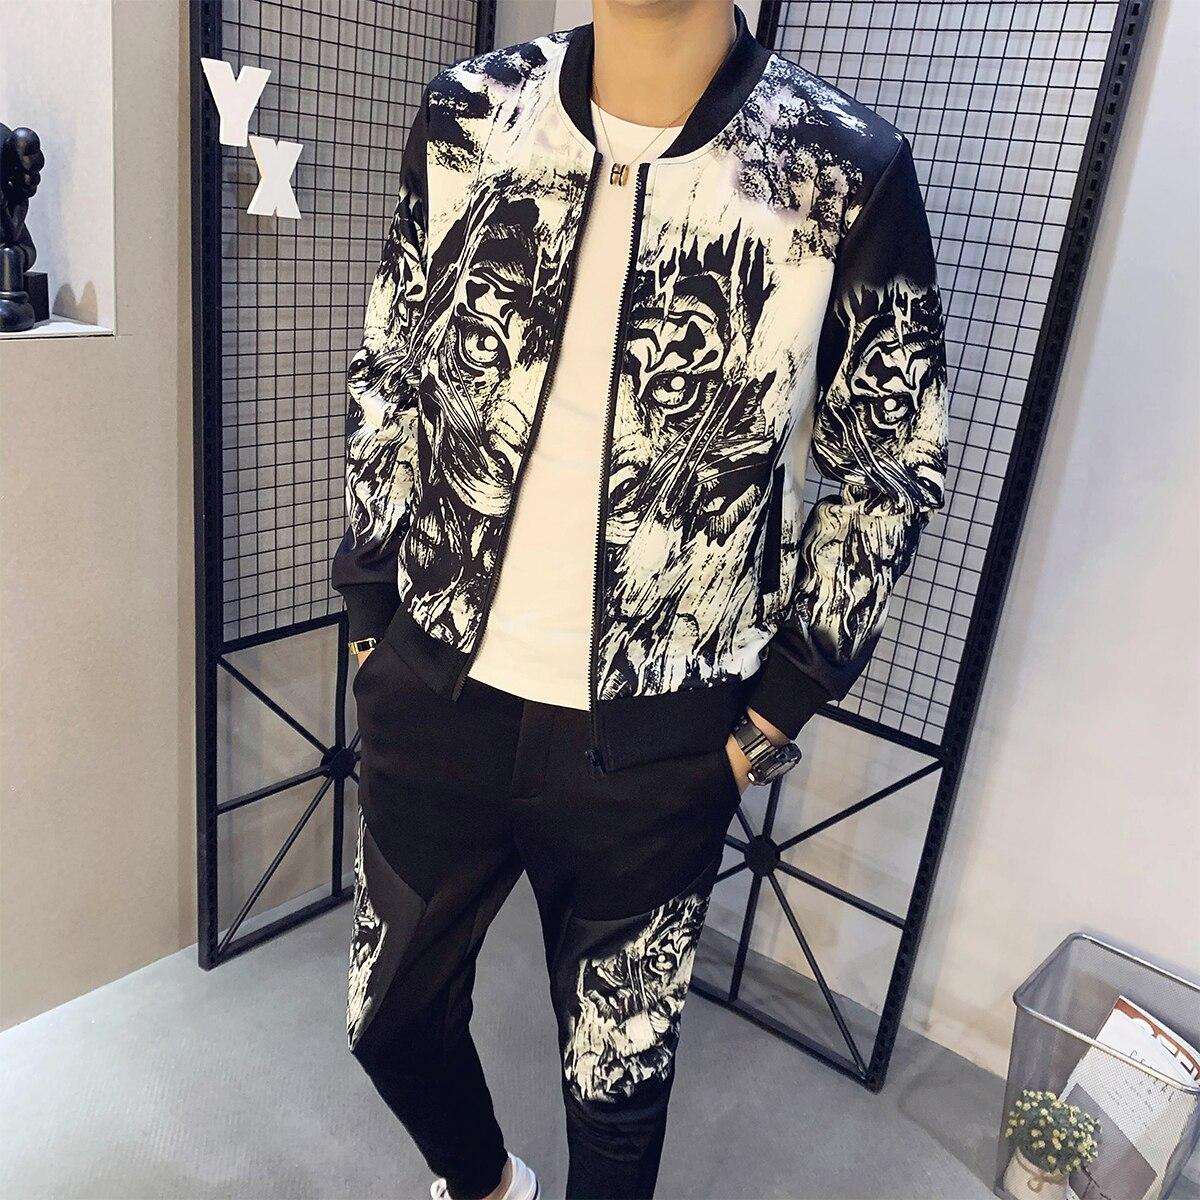 Spring Man Sport 2 Piece Sets Jacket + Pants Chandal Hombre Tracksuit Men Moda Hombre Ropa De Hombre Ropa Hombre 2020 Men's Set